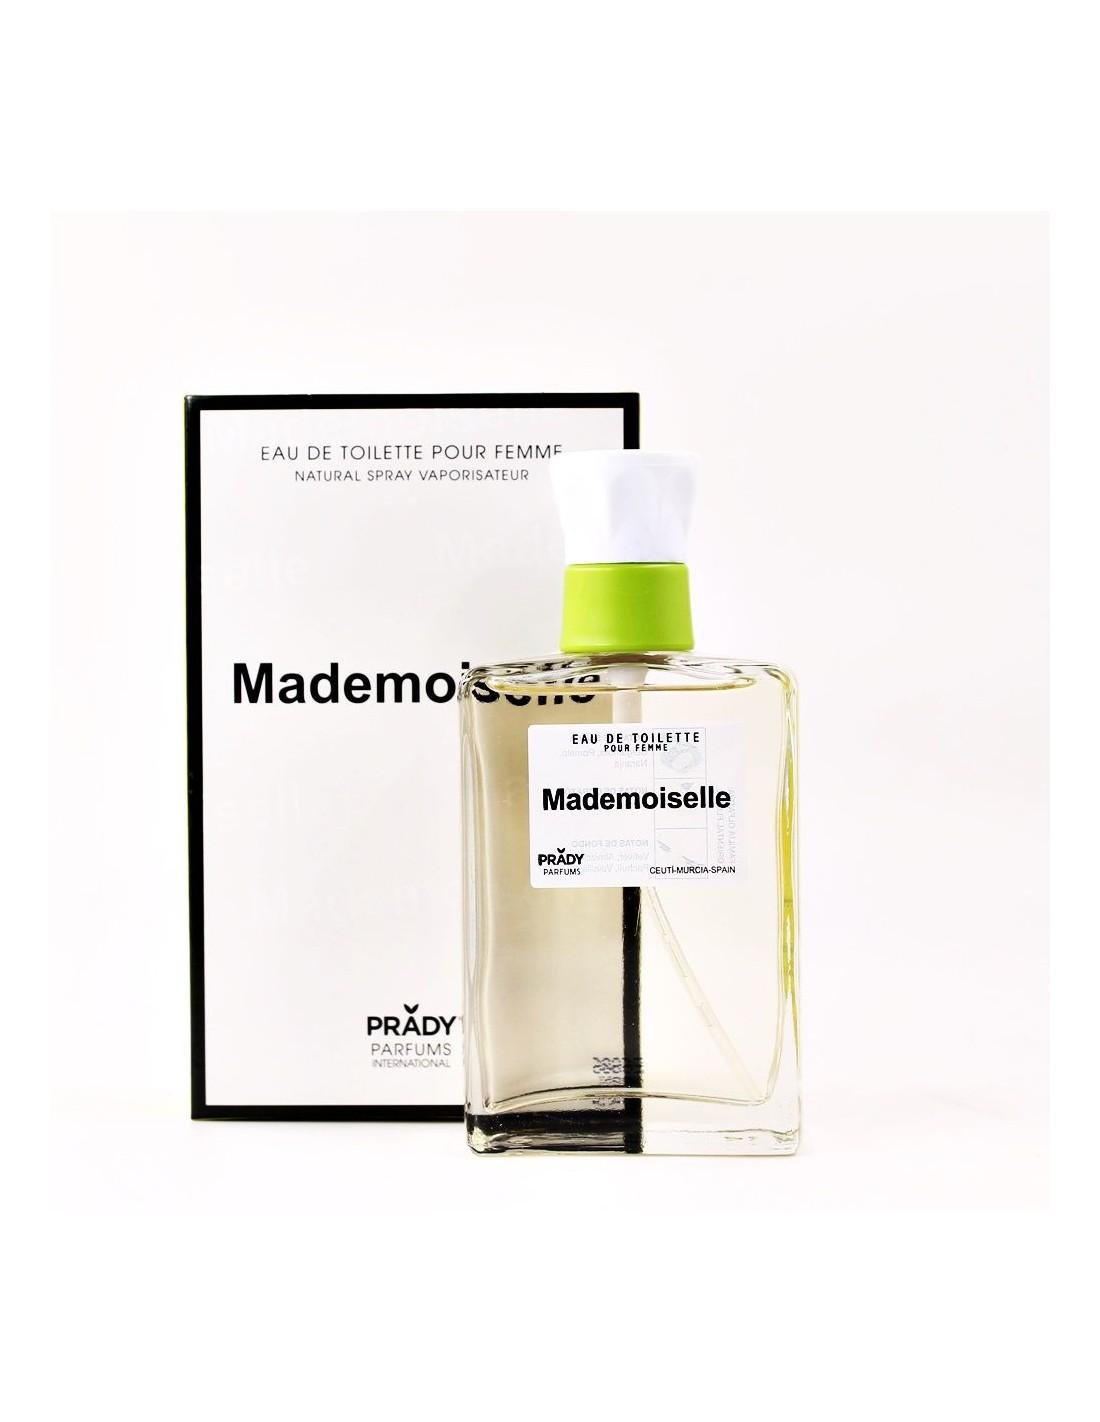 Parfum generique parfum prady femme mademoiselle